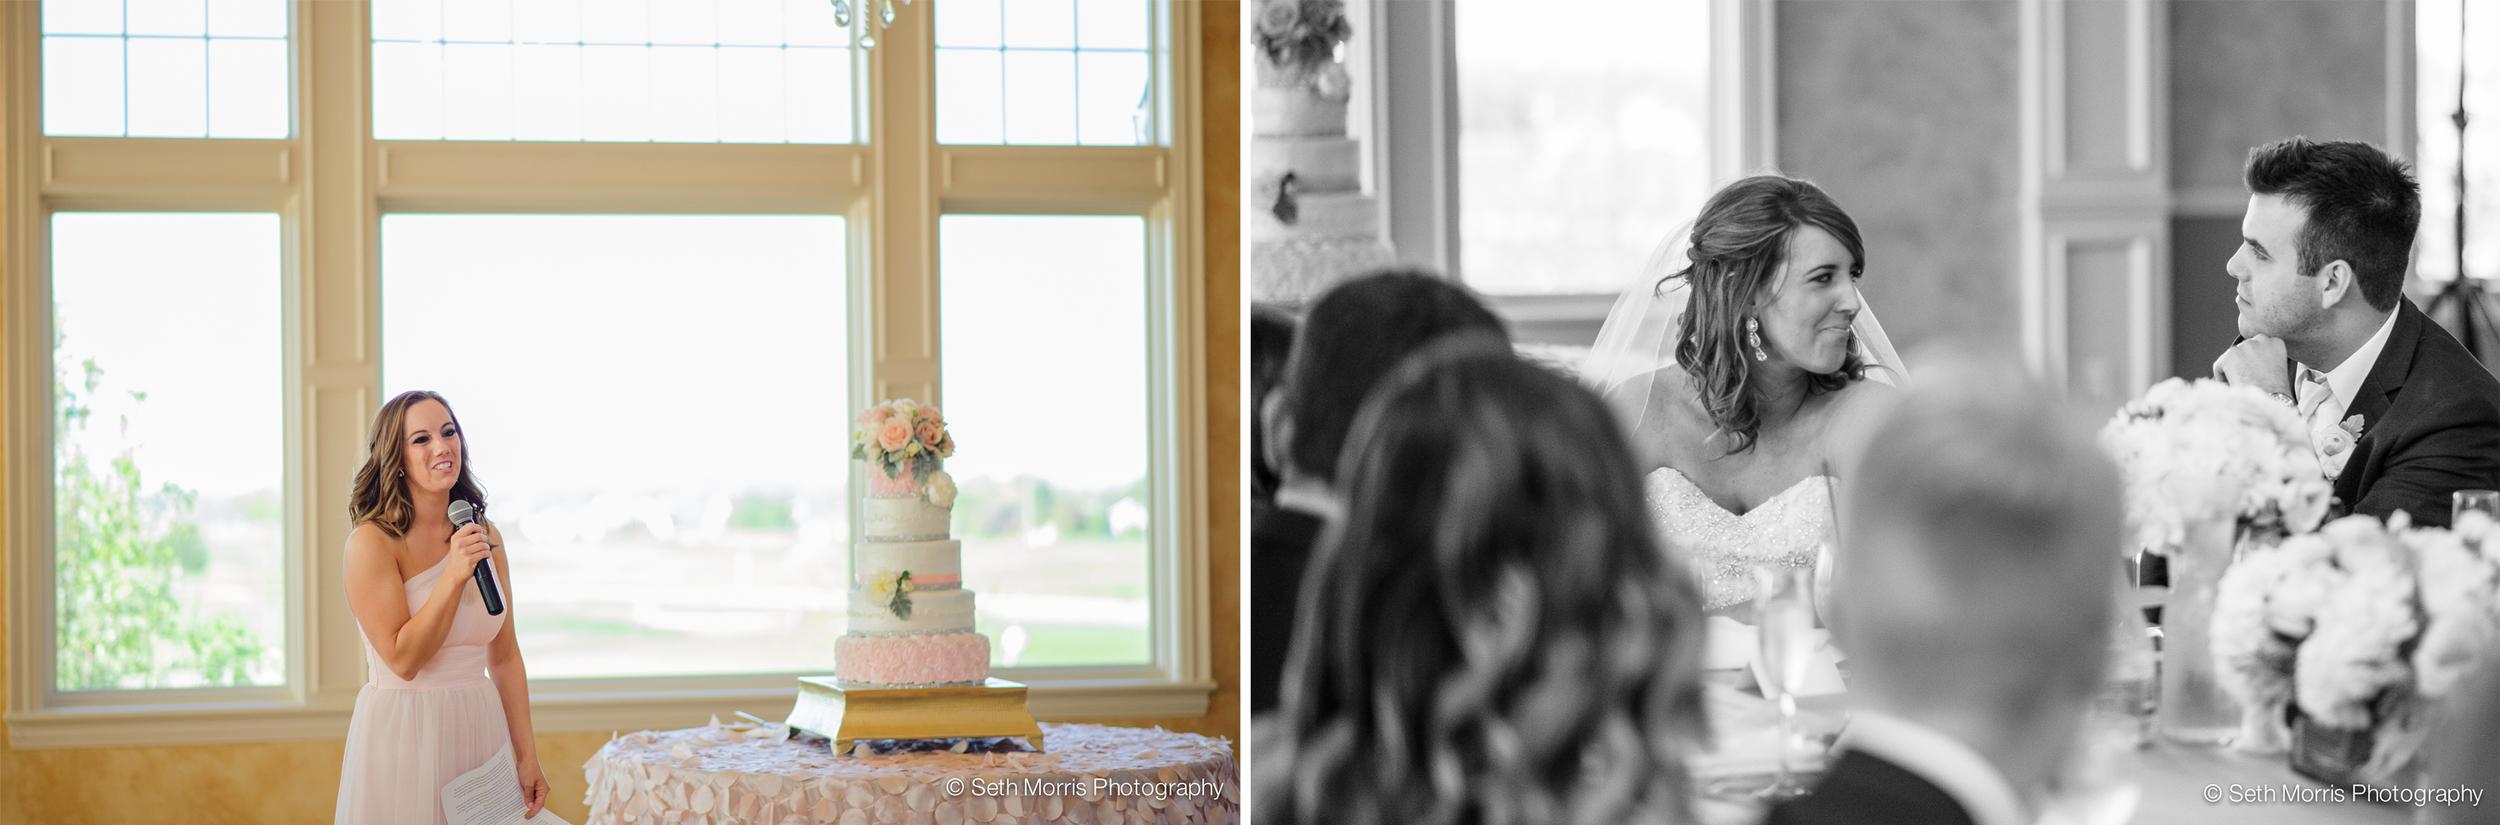 metamora-fields-wedding-photographer-peoria-180.jpg